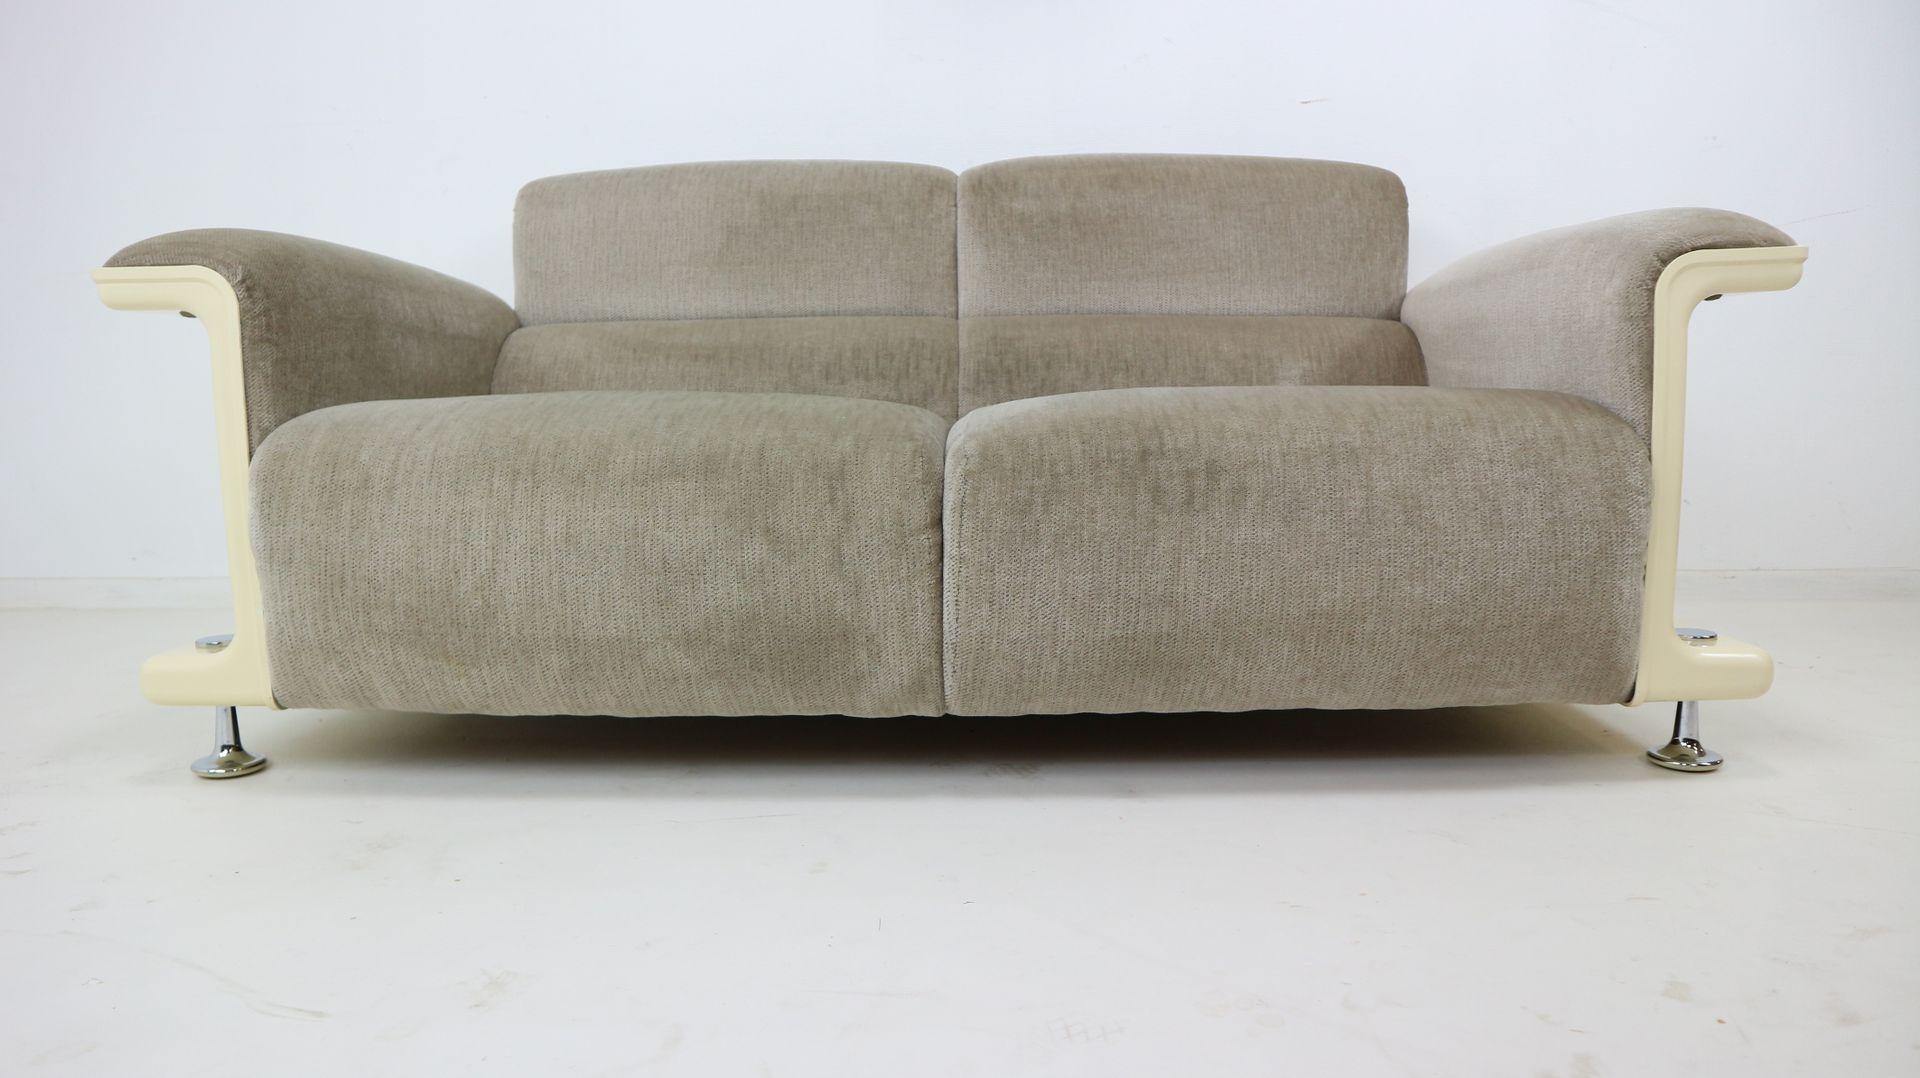 bz28 two seater sofa by gerd lange for 39 t spectrum 1970s. Black Bedroom Furniture Sets. Home Design Ideas